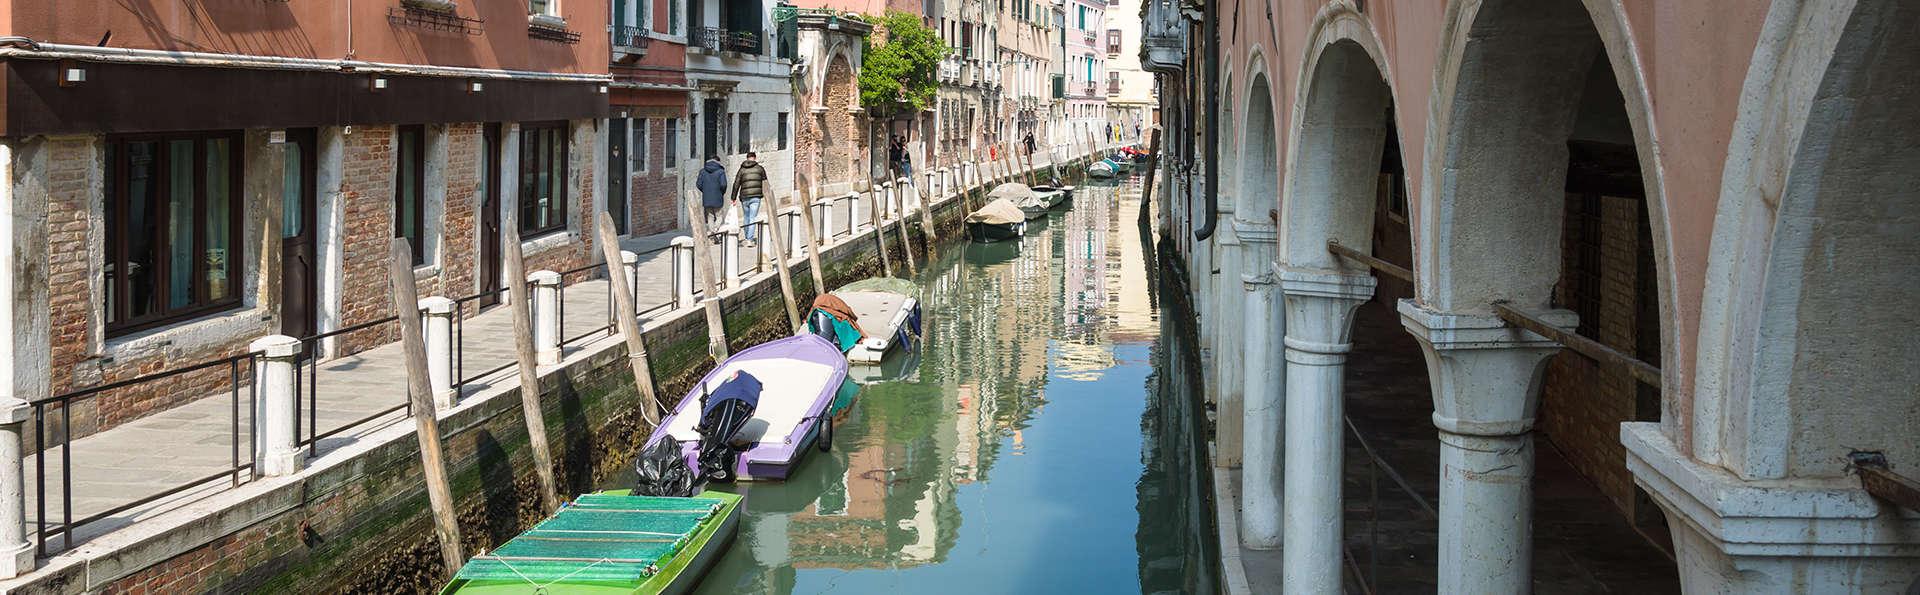 Antony Palace Hotel - Edit_Venecia2.jpg